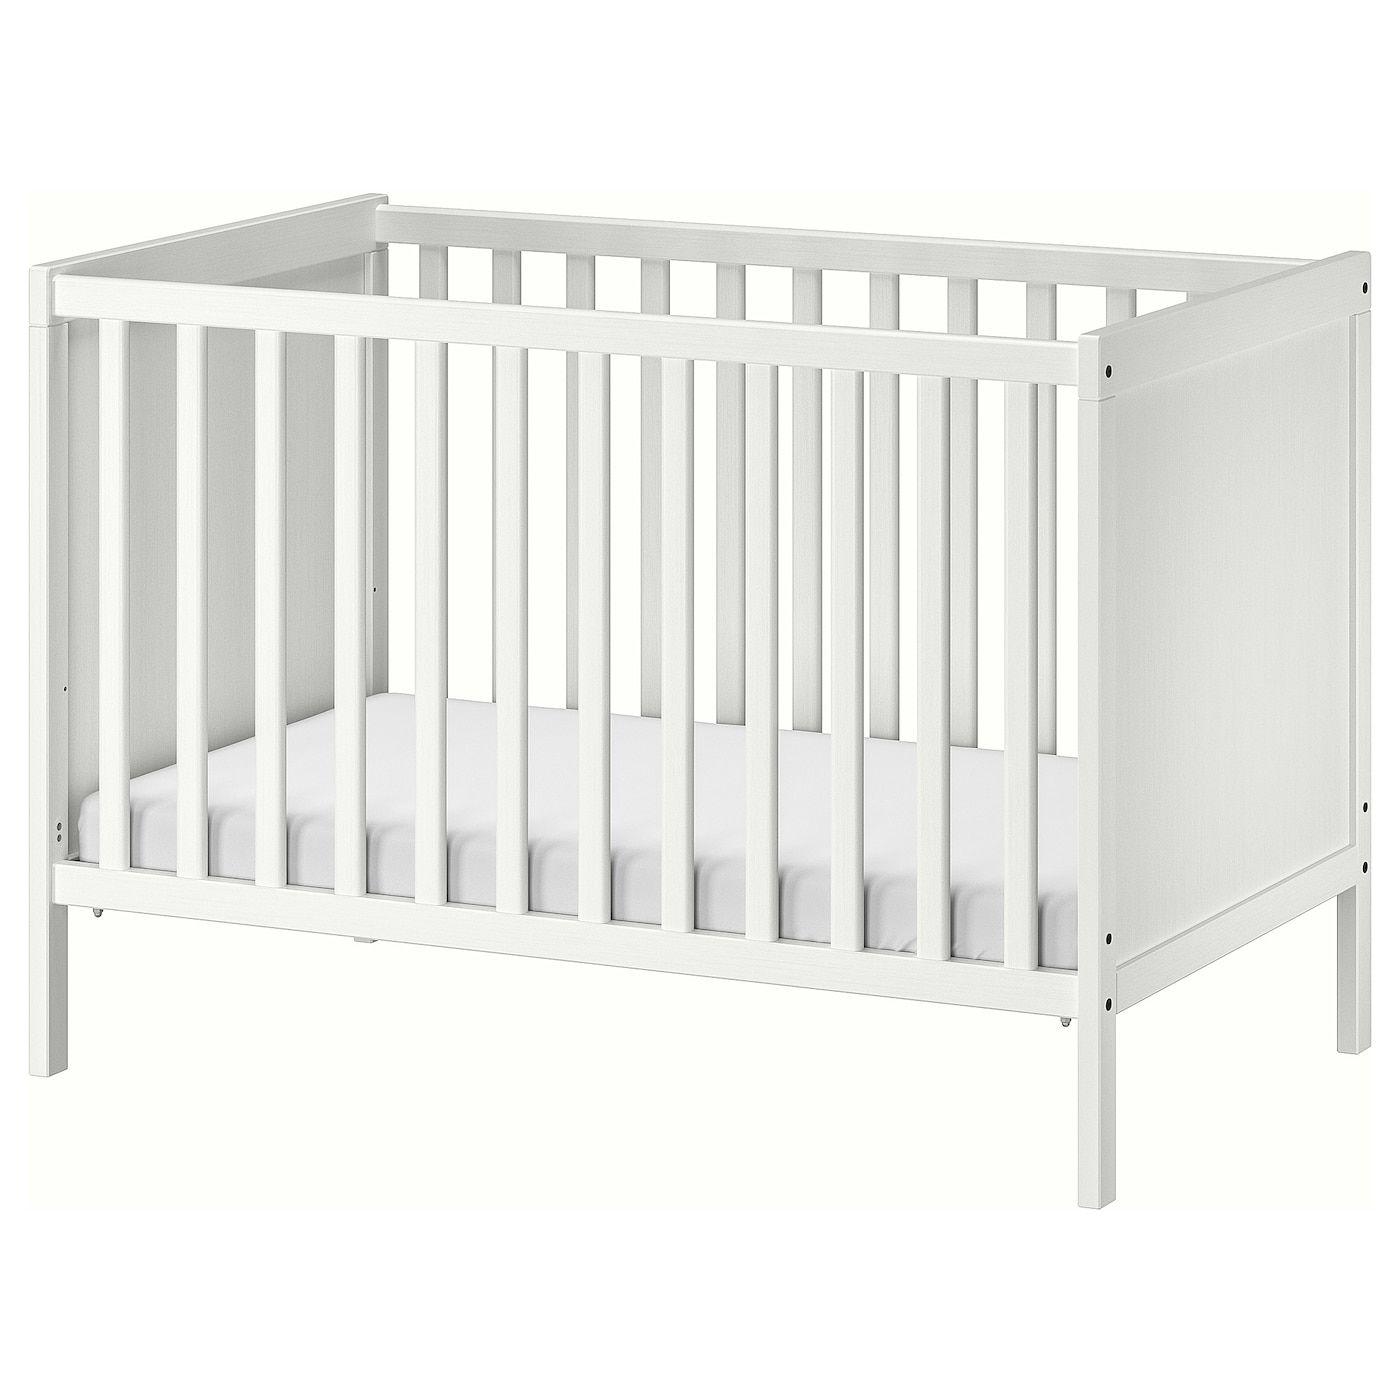 Sundvik Crib White 27 1 2x52 In 2020 Ikea Crib Cribs Ikea